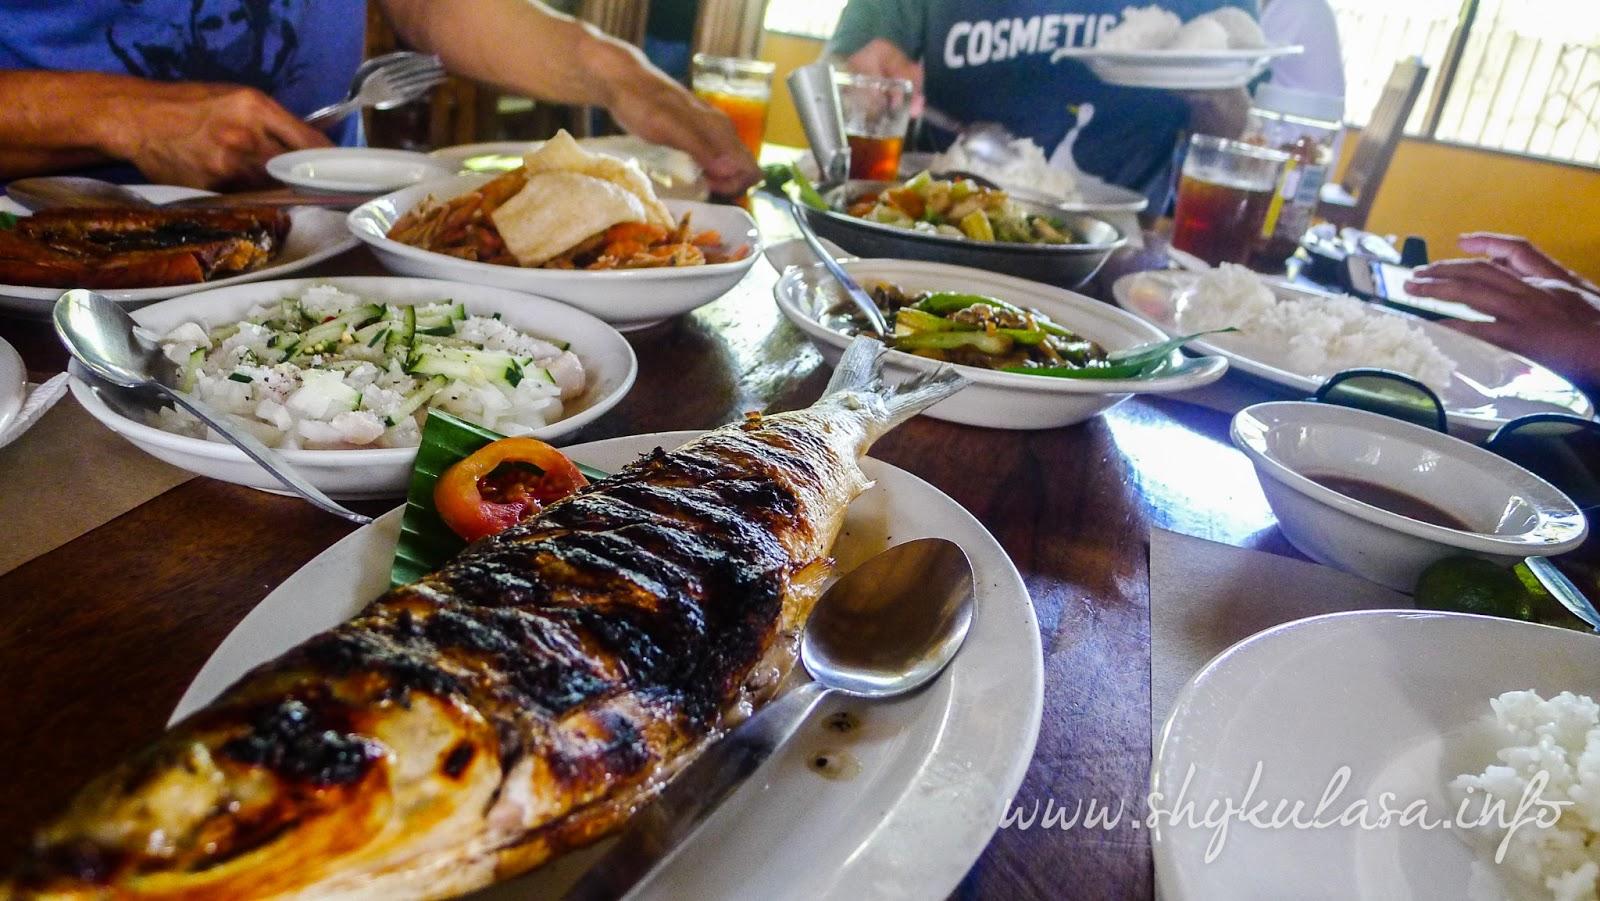 urdaneta city : matutina's seafood restaurant ~ shie went to town